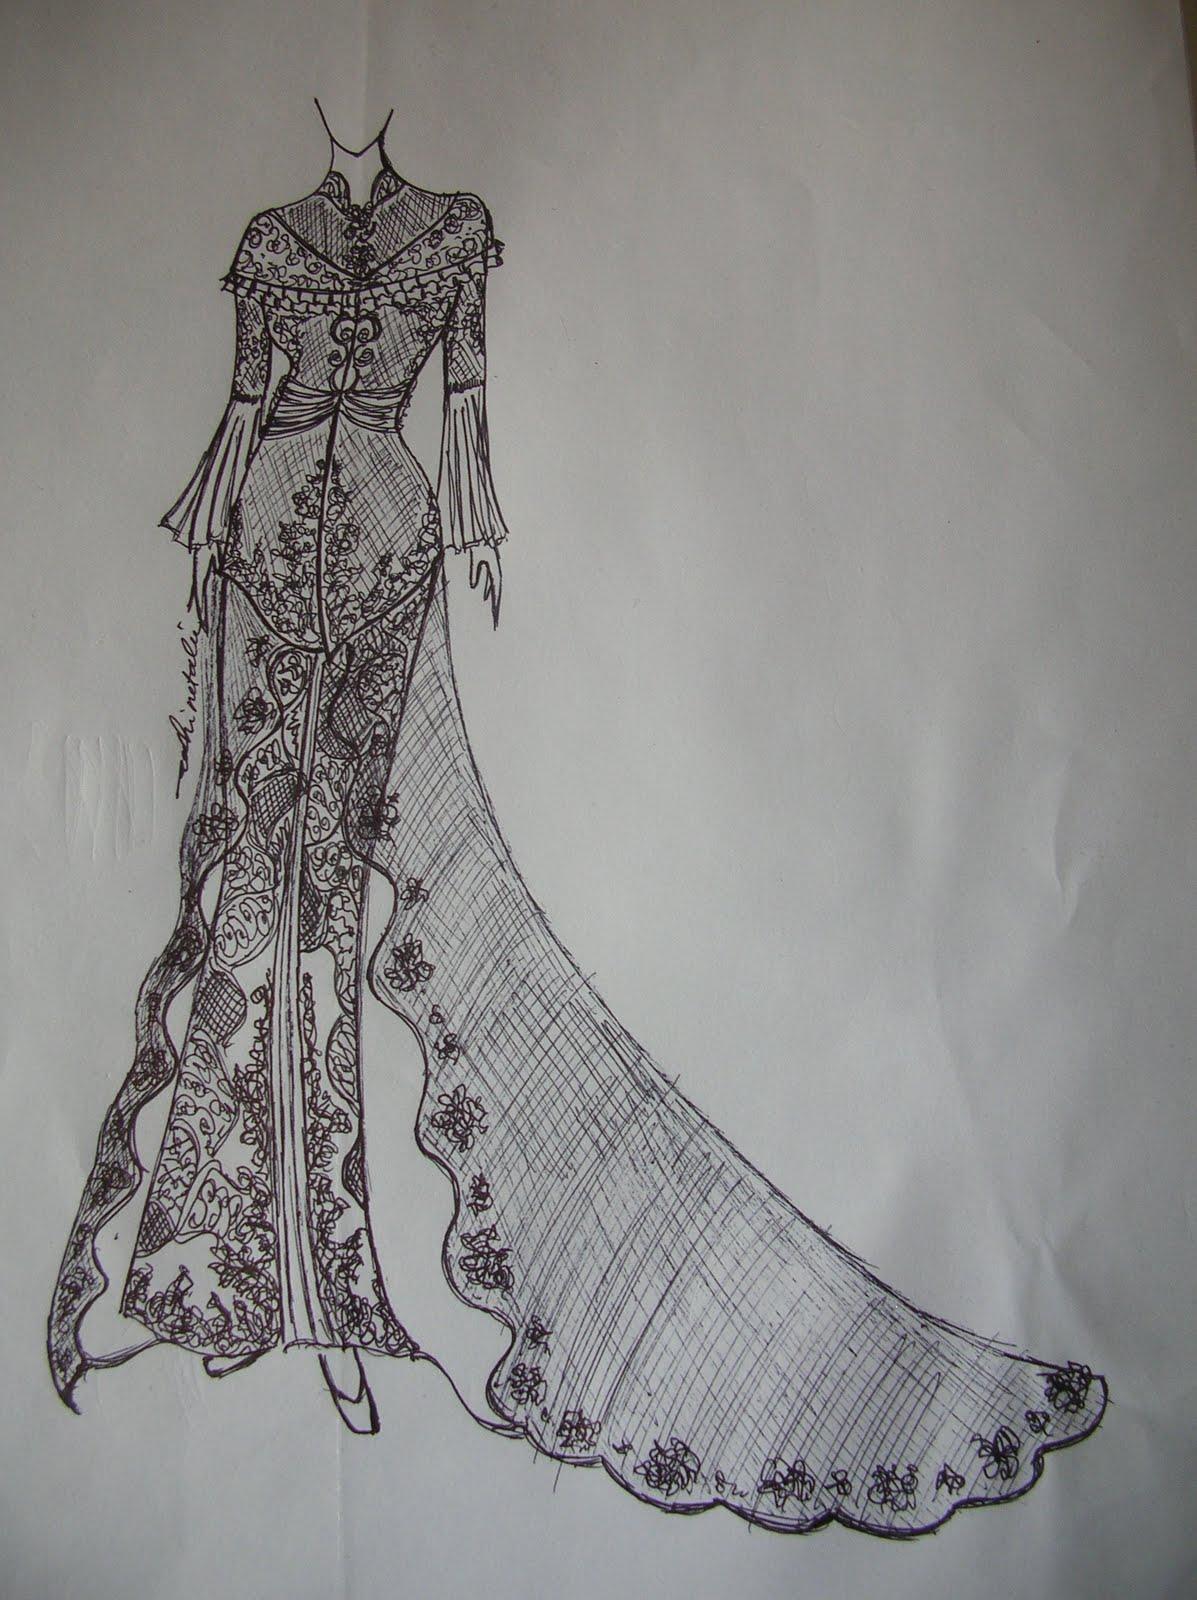 Kumpulan Cara Menggambar Sketsa Desain Baju Kebaya Muslimah